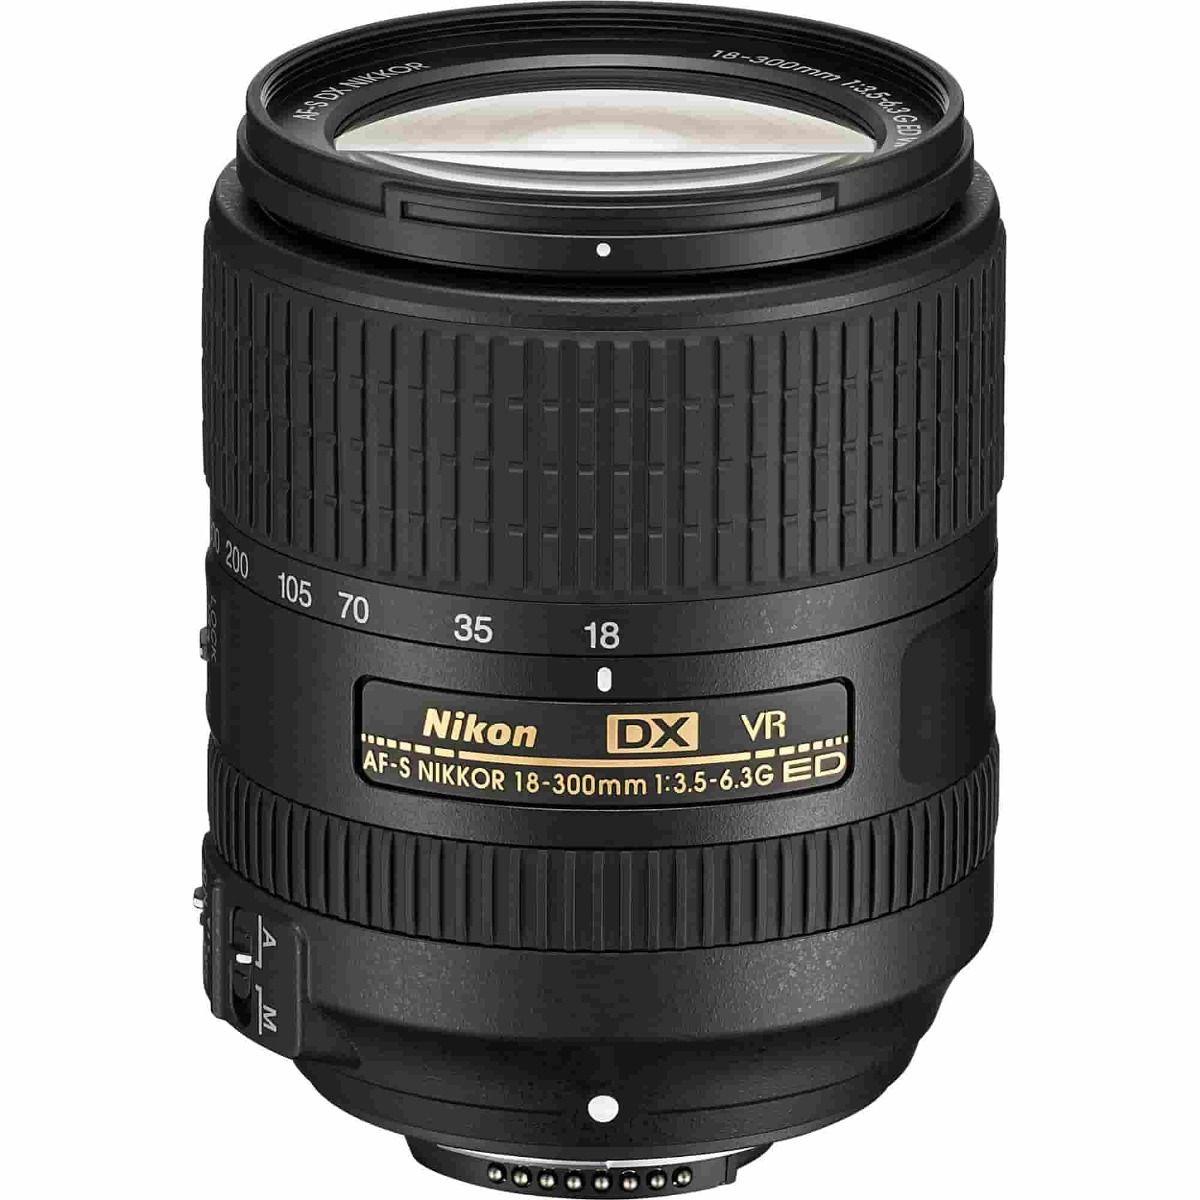 Nikon AF-S 18-300mm f/3.5-6.3G ED VR DX Lens,Nikon AF-S 18-300mm f/3.5-6.3G ED VR DX Lens,Nikon AF-S 18-300mm f/3.5-6.3G ED VR DX Lens